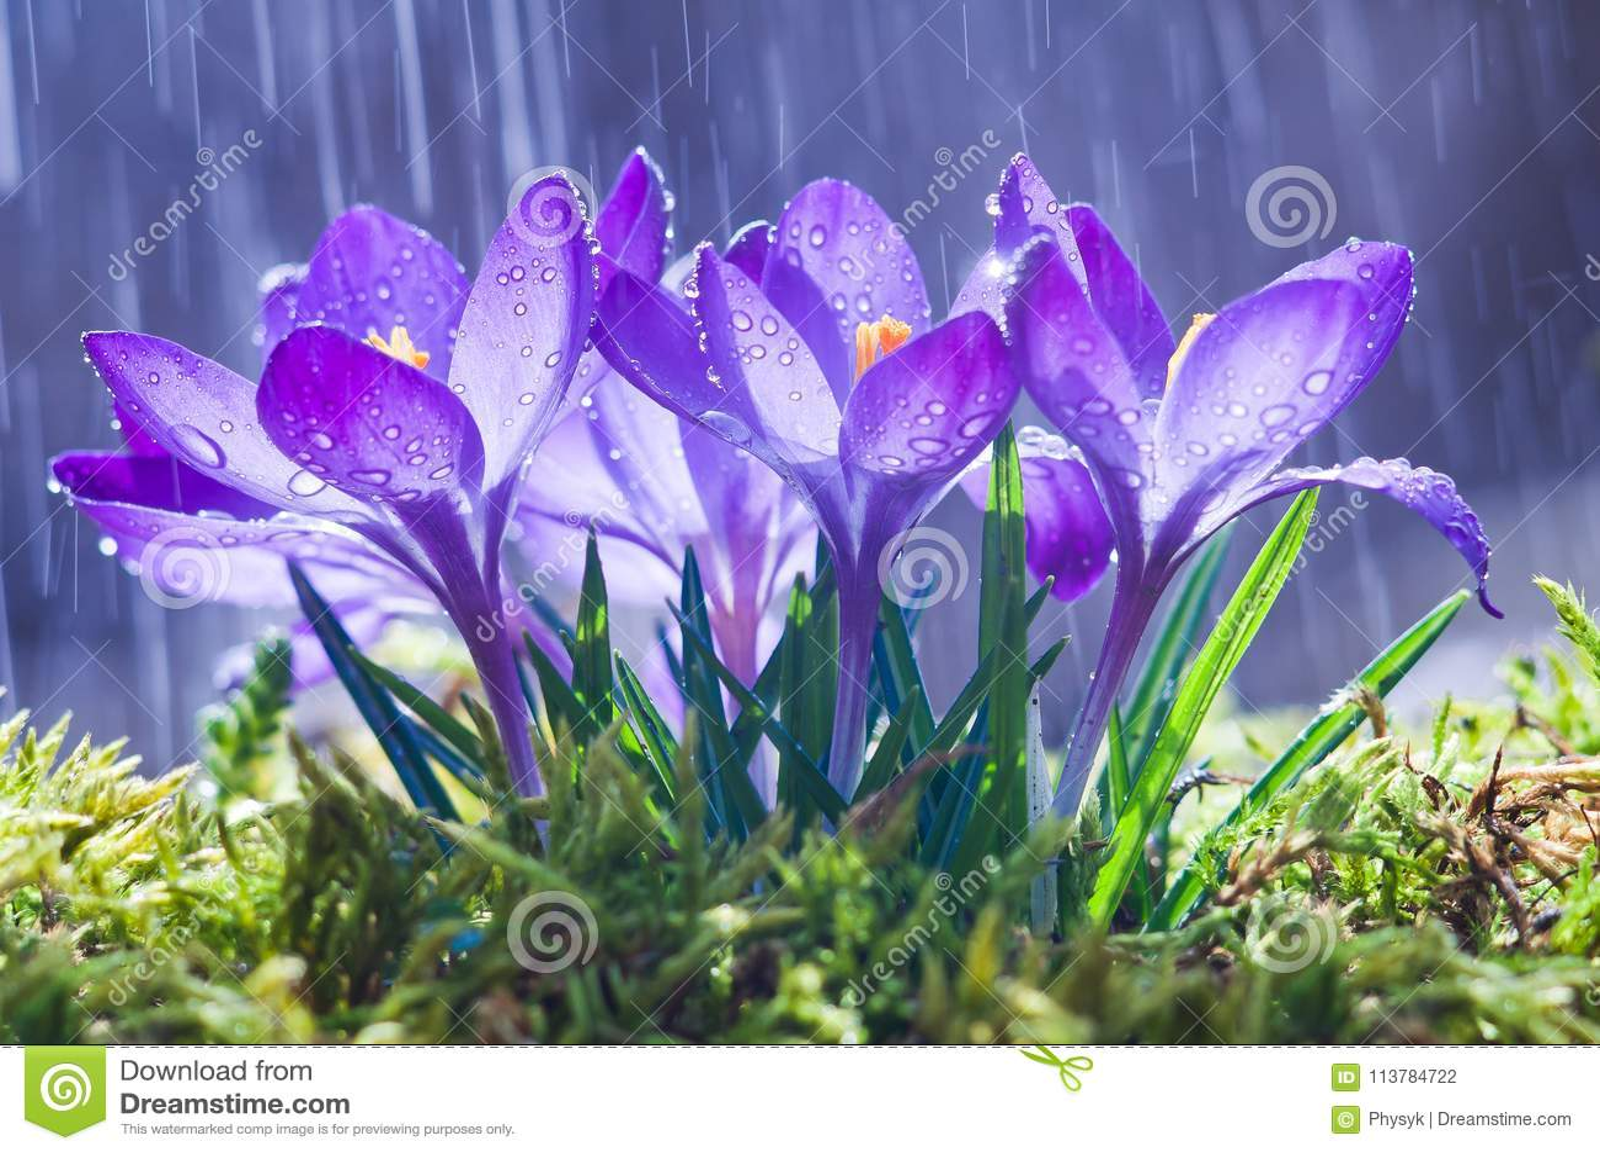 Vårblommor av blåa krokusar i droppar av vatten på backgroen